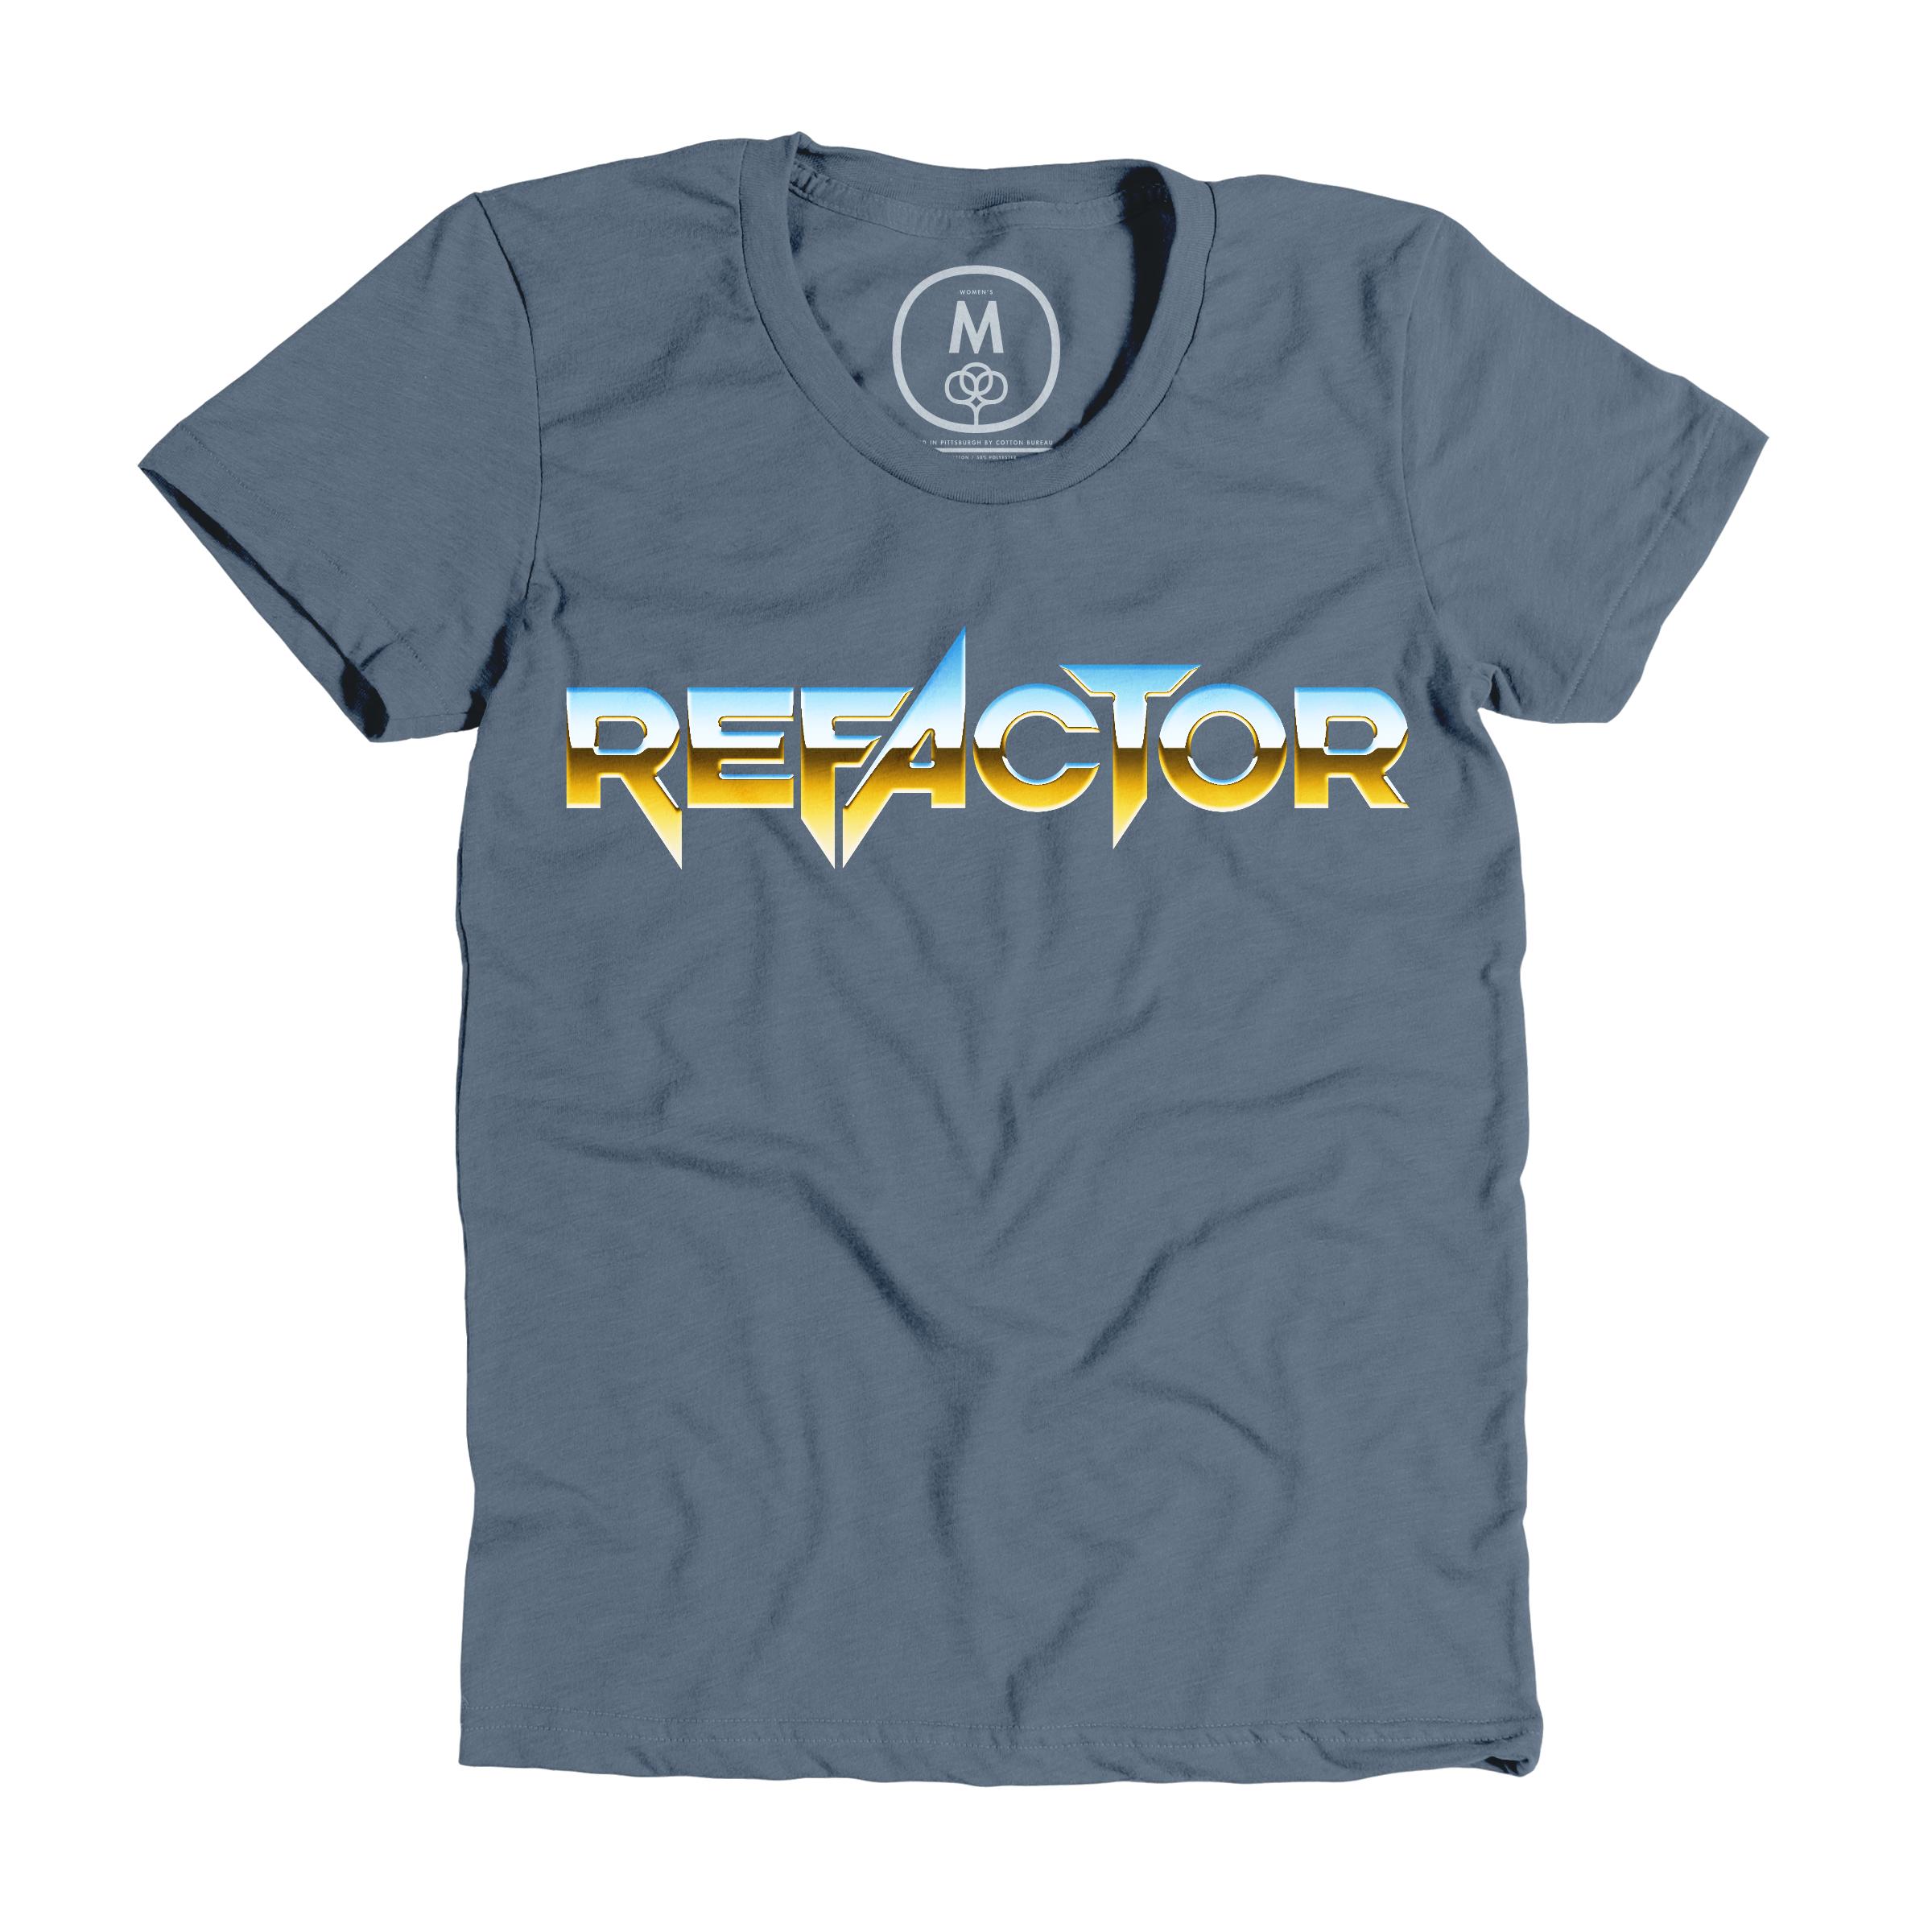 Refactor Indigo (Women's)